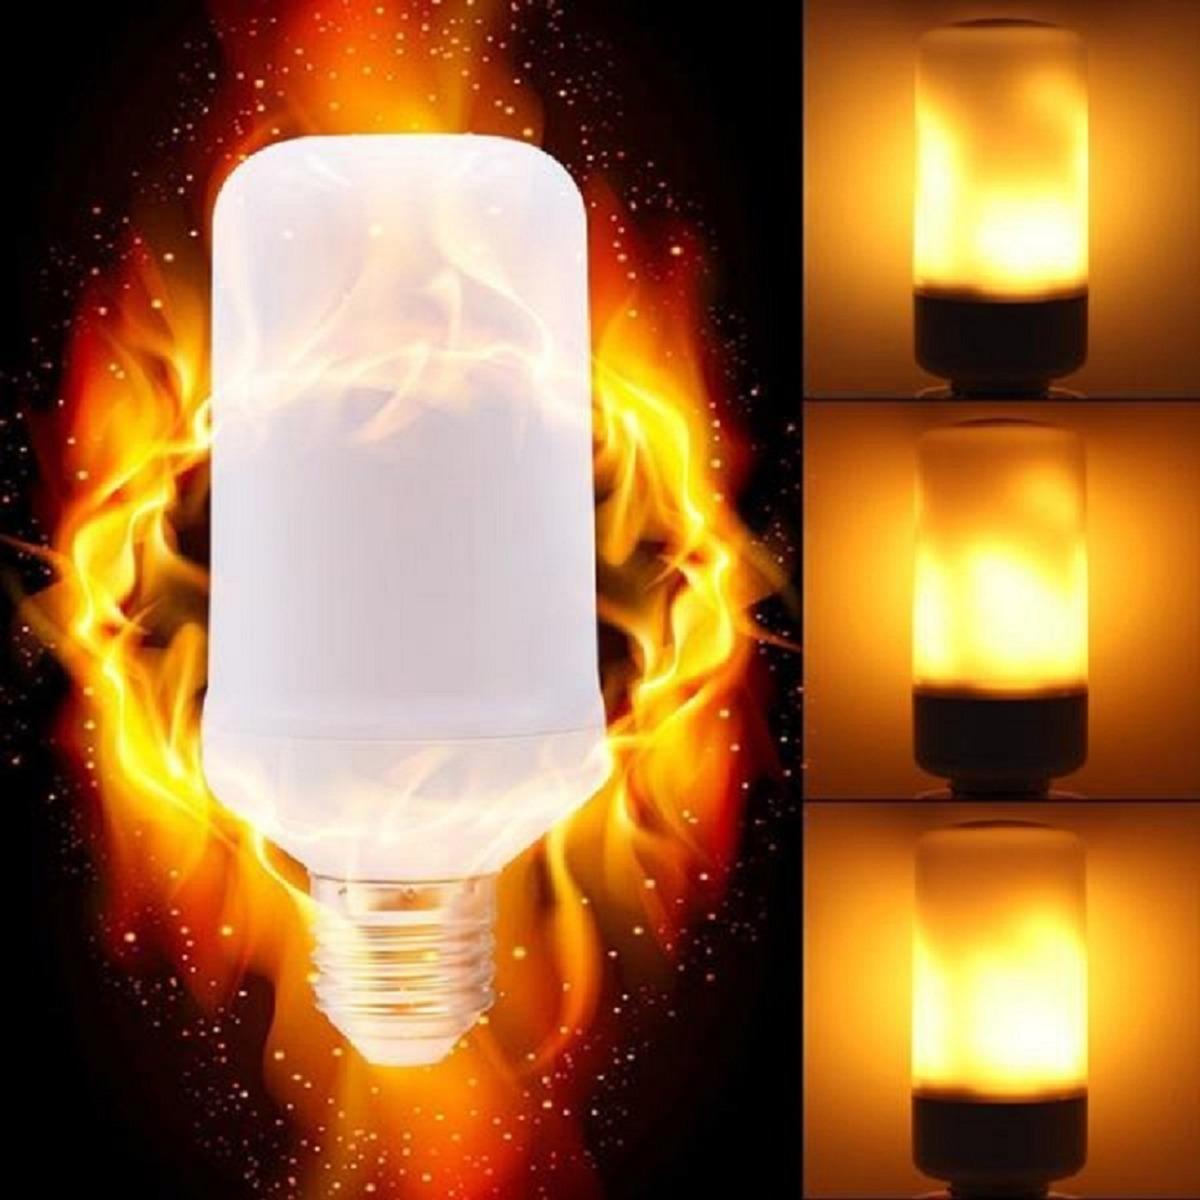 d5acba70d29 Lampara Led Fuego Antorcha Llama 3 Efectos 4w E27 220v -   280